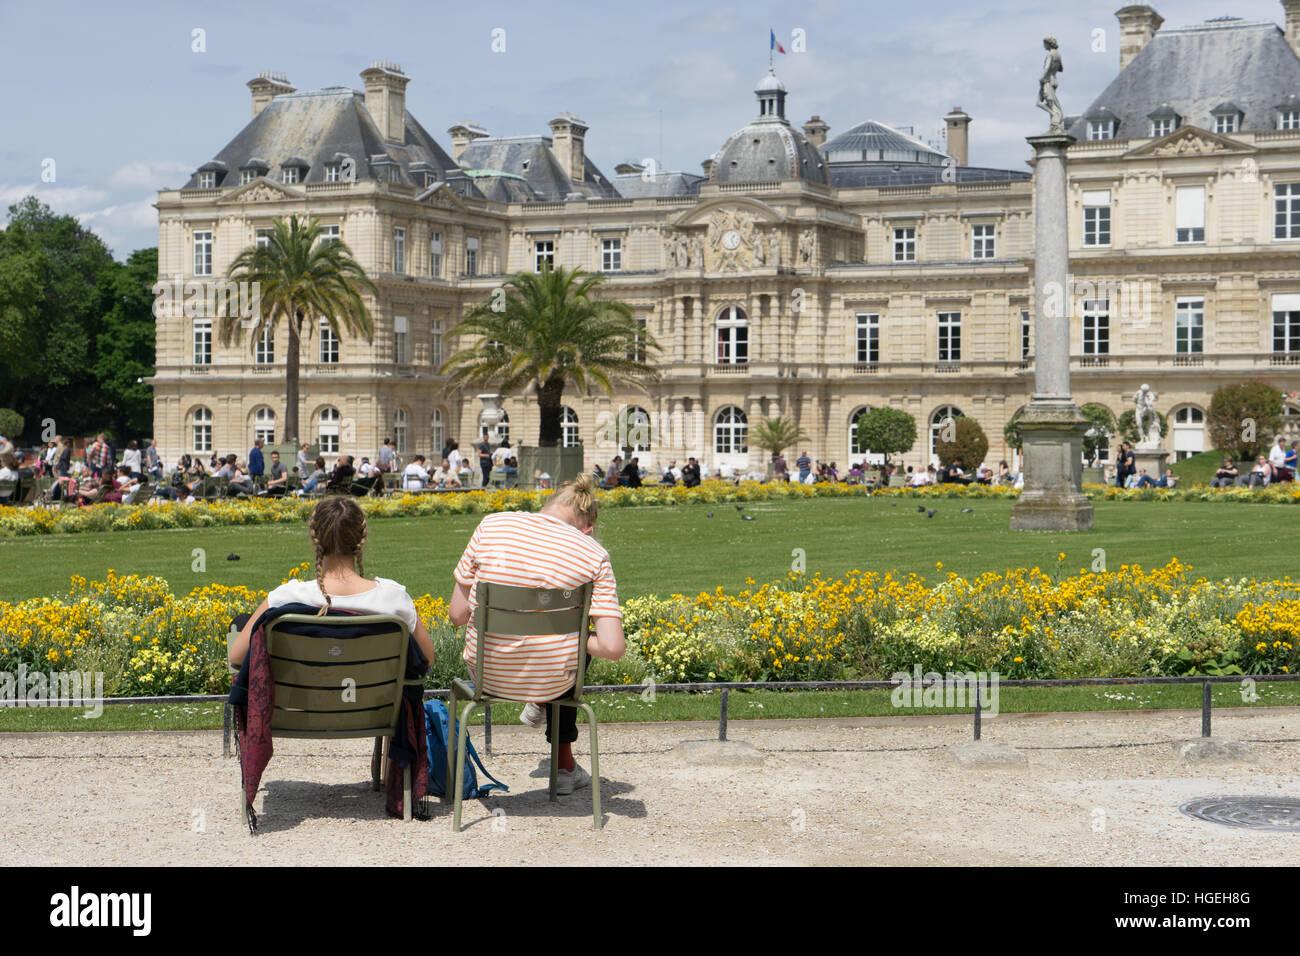 People enjoying the sun in Jardin du Luxembourg, Paris, France - Stock Image